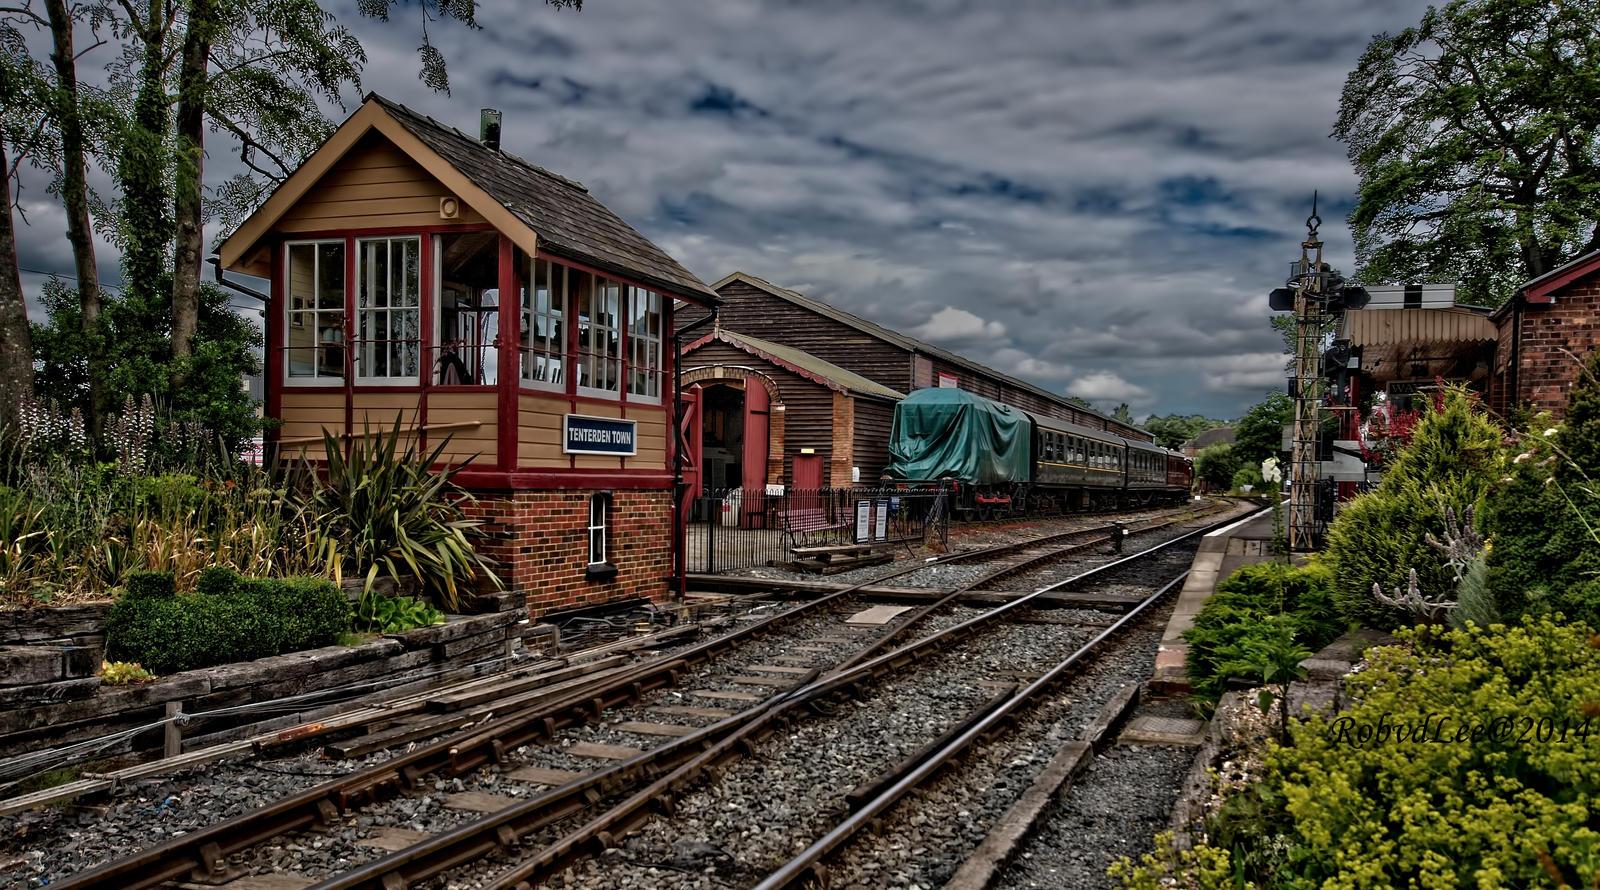 Tenterden station by forgottenson1